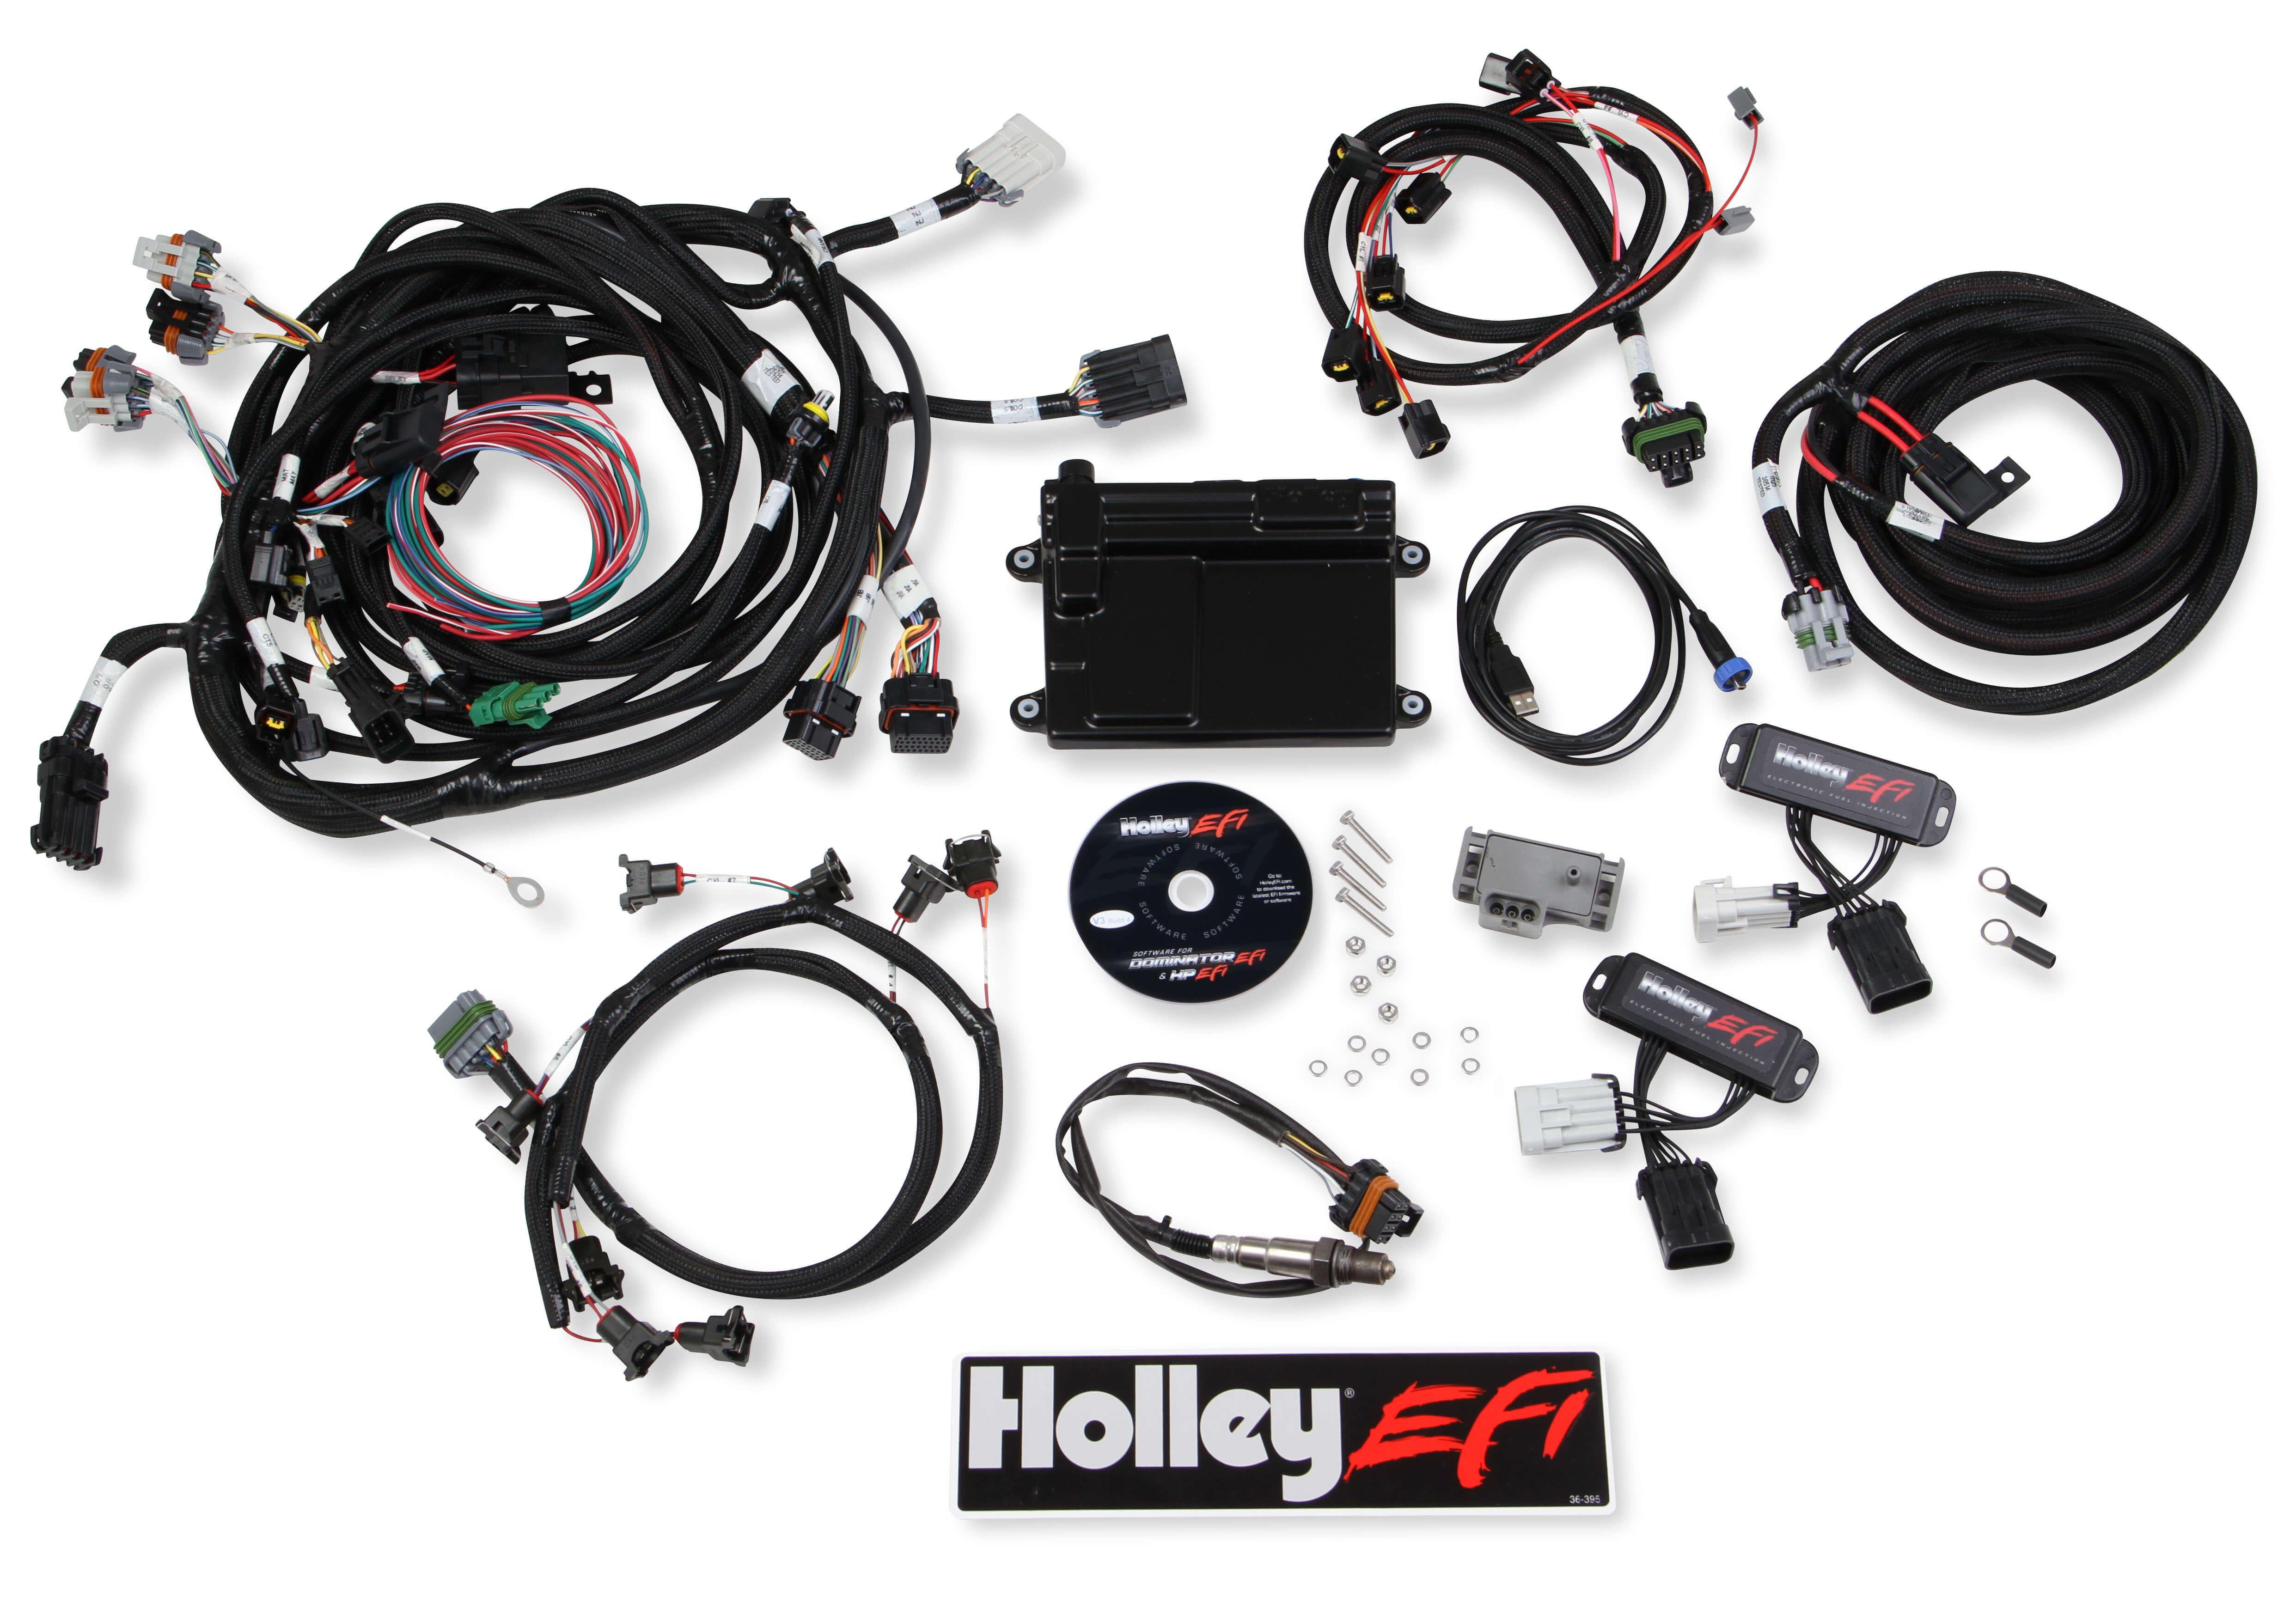 1999-2004 Holley EFI ECU & HARNESS KIT 4 Valve Modular Engines